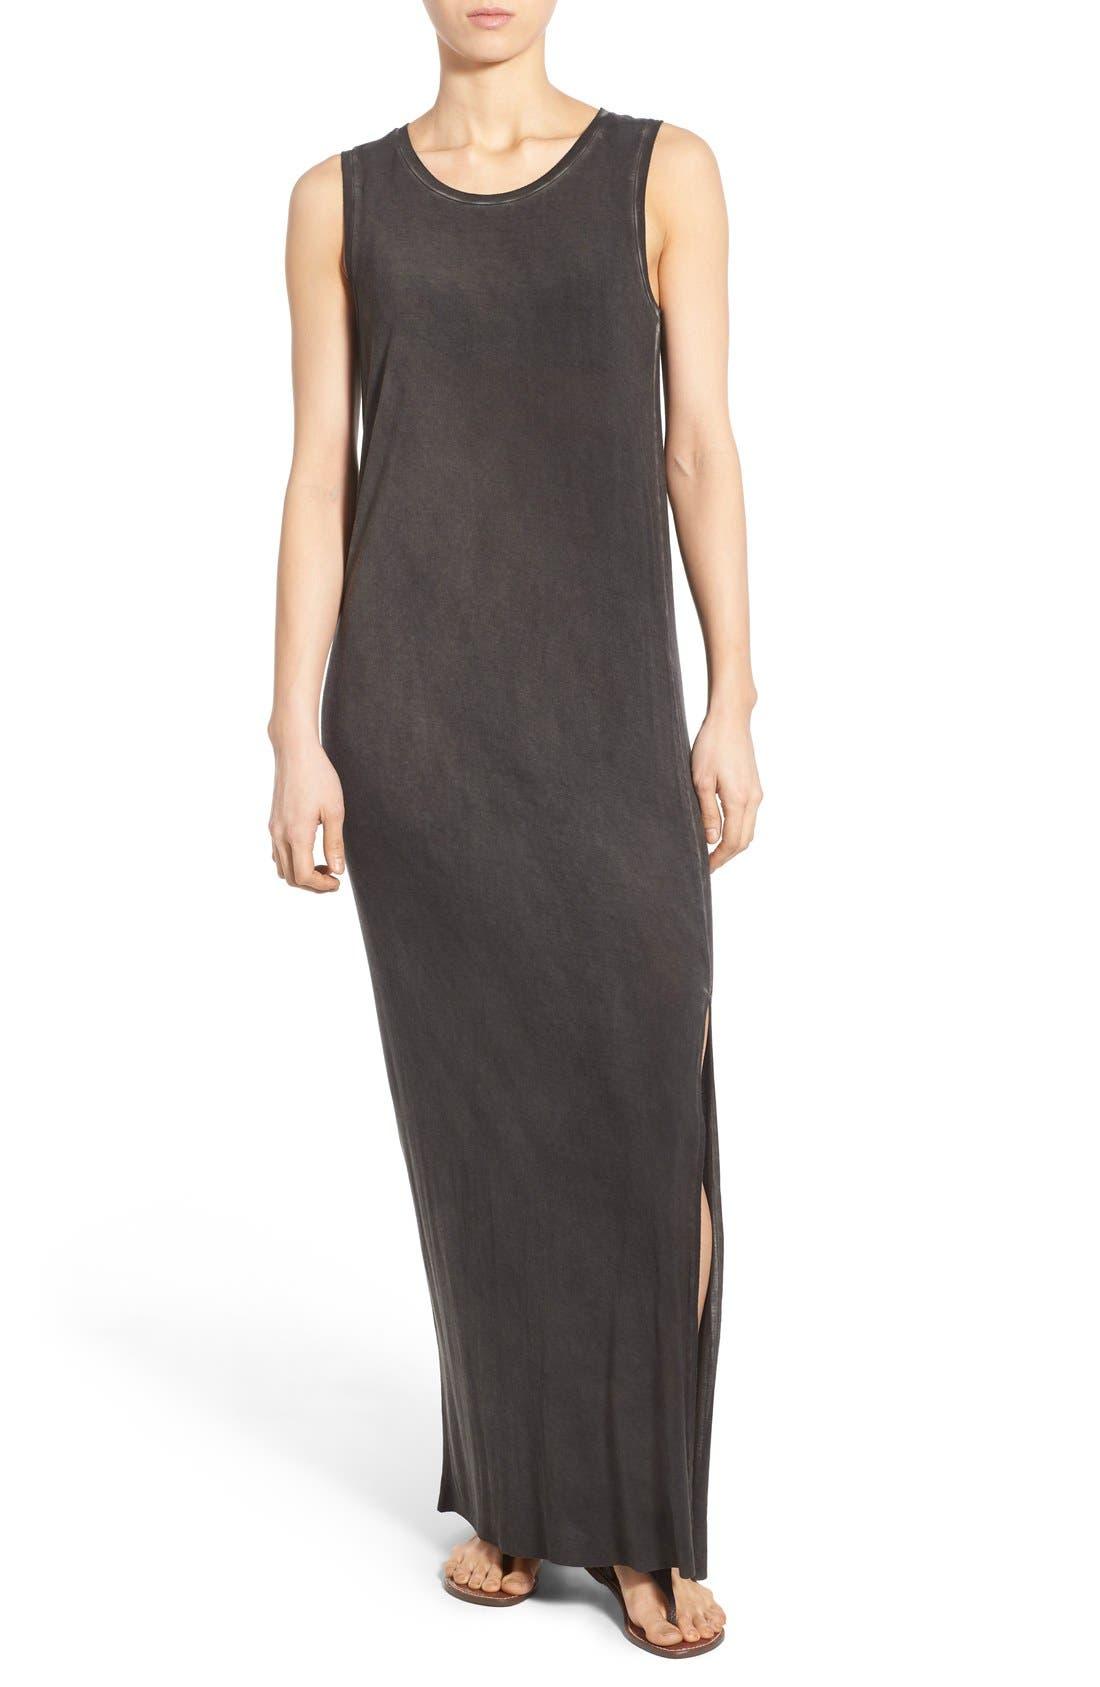 Alternate Image 1 Selected - PAIGE 'Gretchen' Maxi Dress